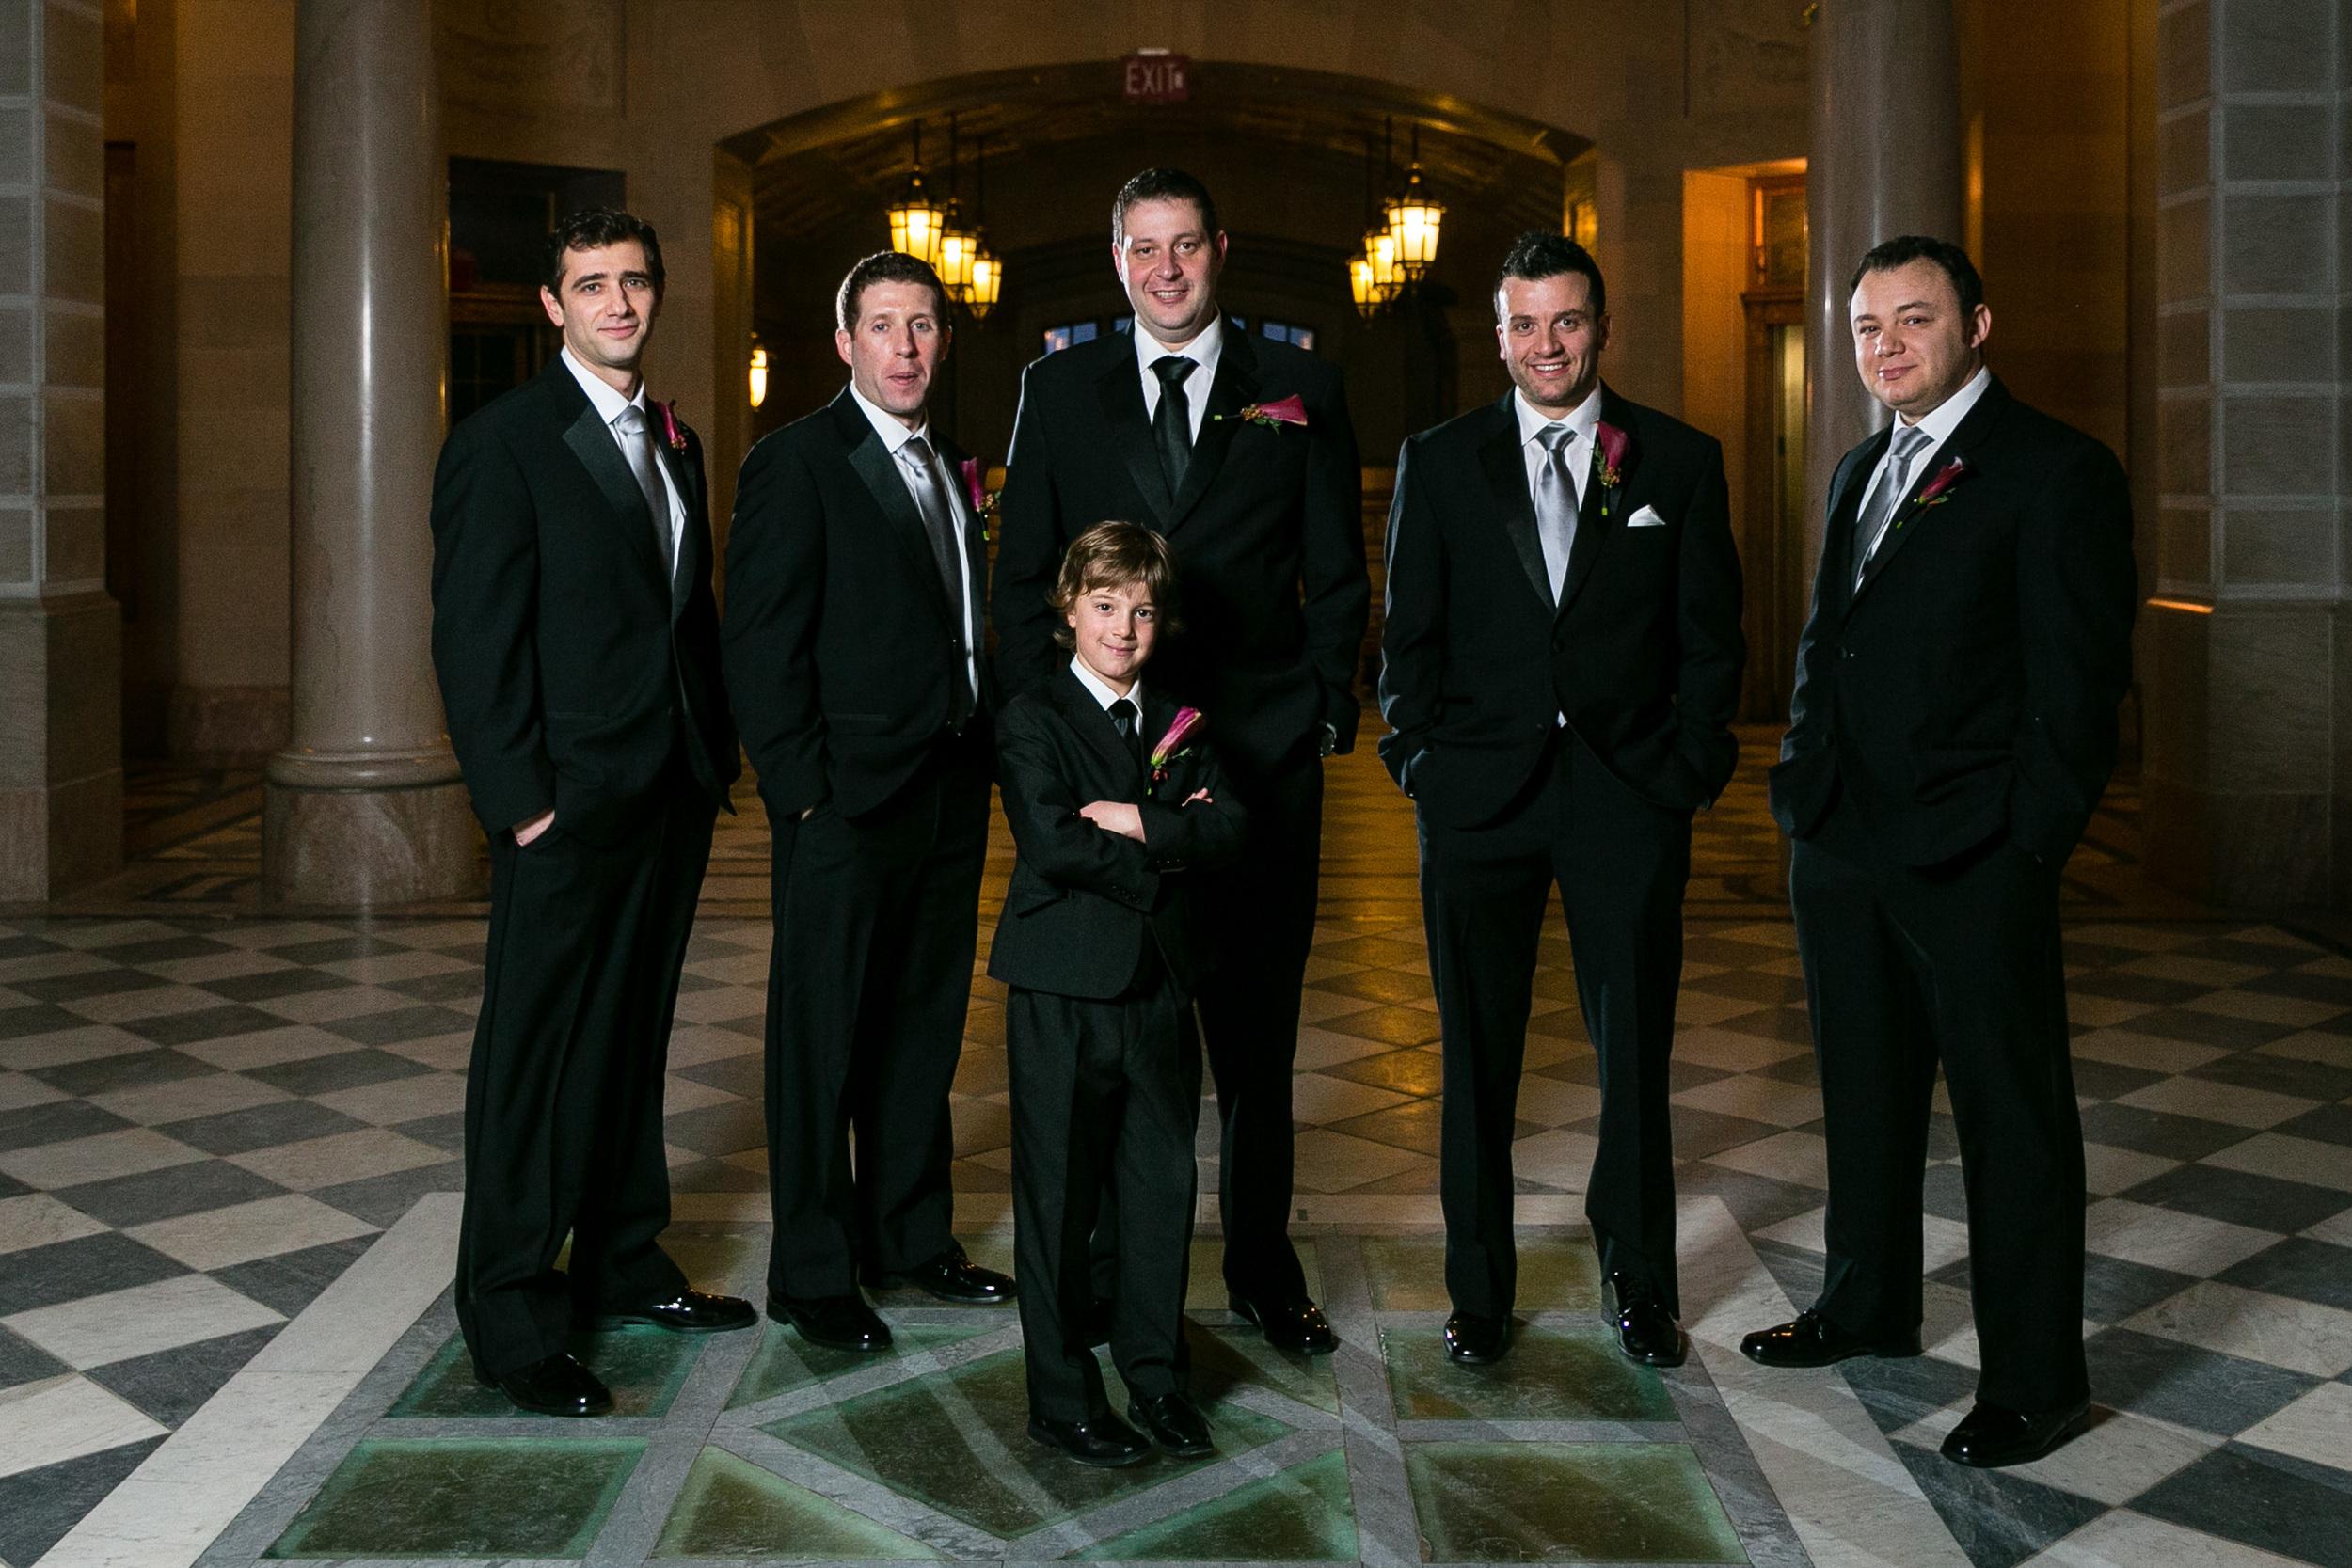 Jewish-Wedding-The-Society-Room-of-Hartford-Connecticut-Documentary-Wedding-Photography-Jacek-Dolata-6.jpg